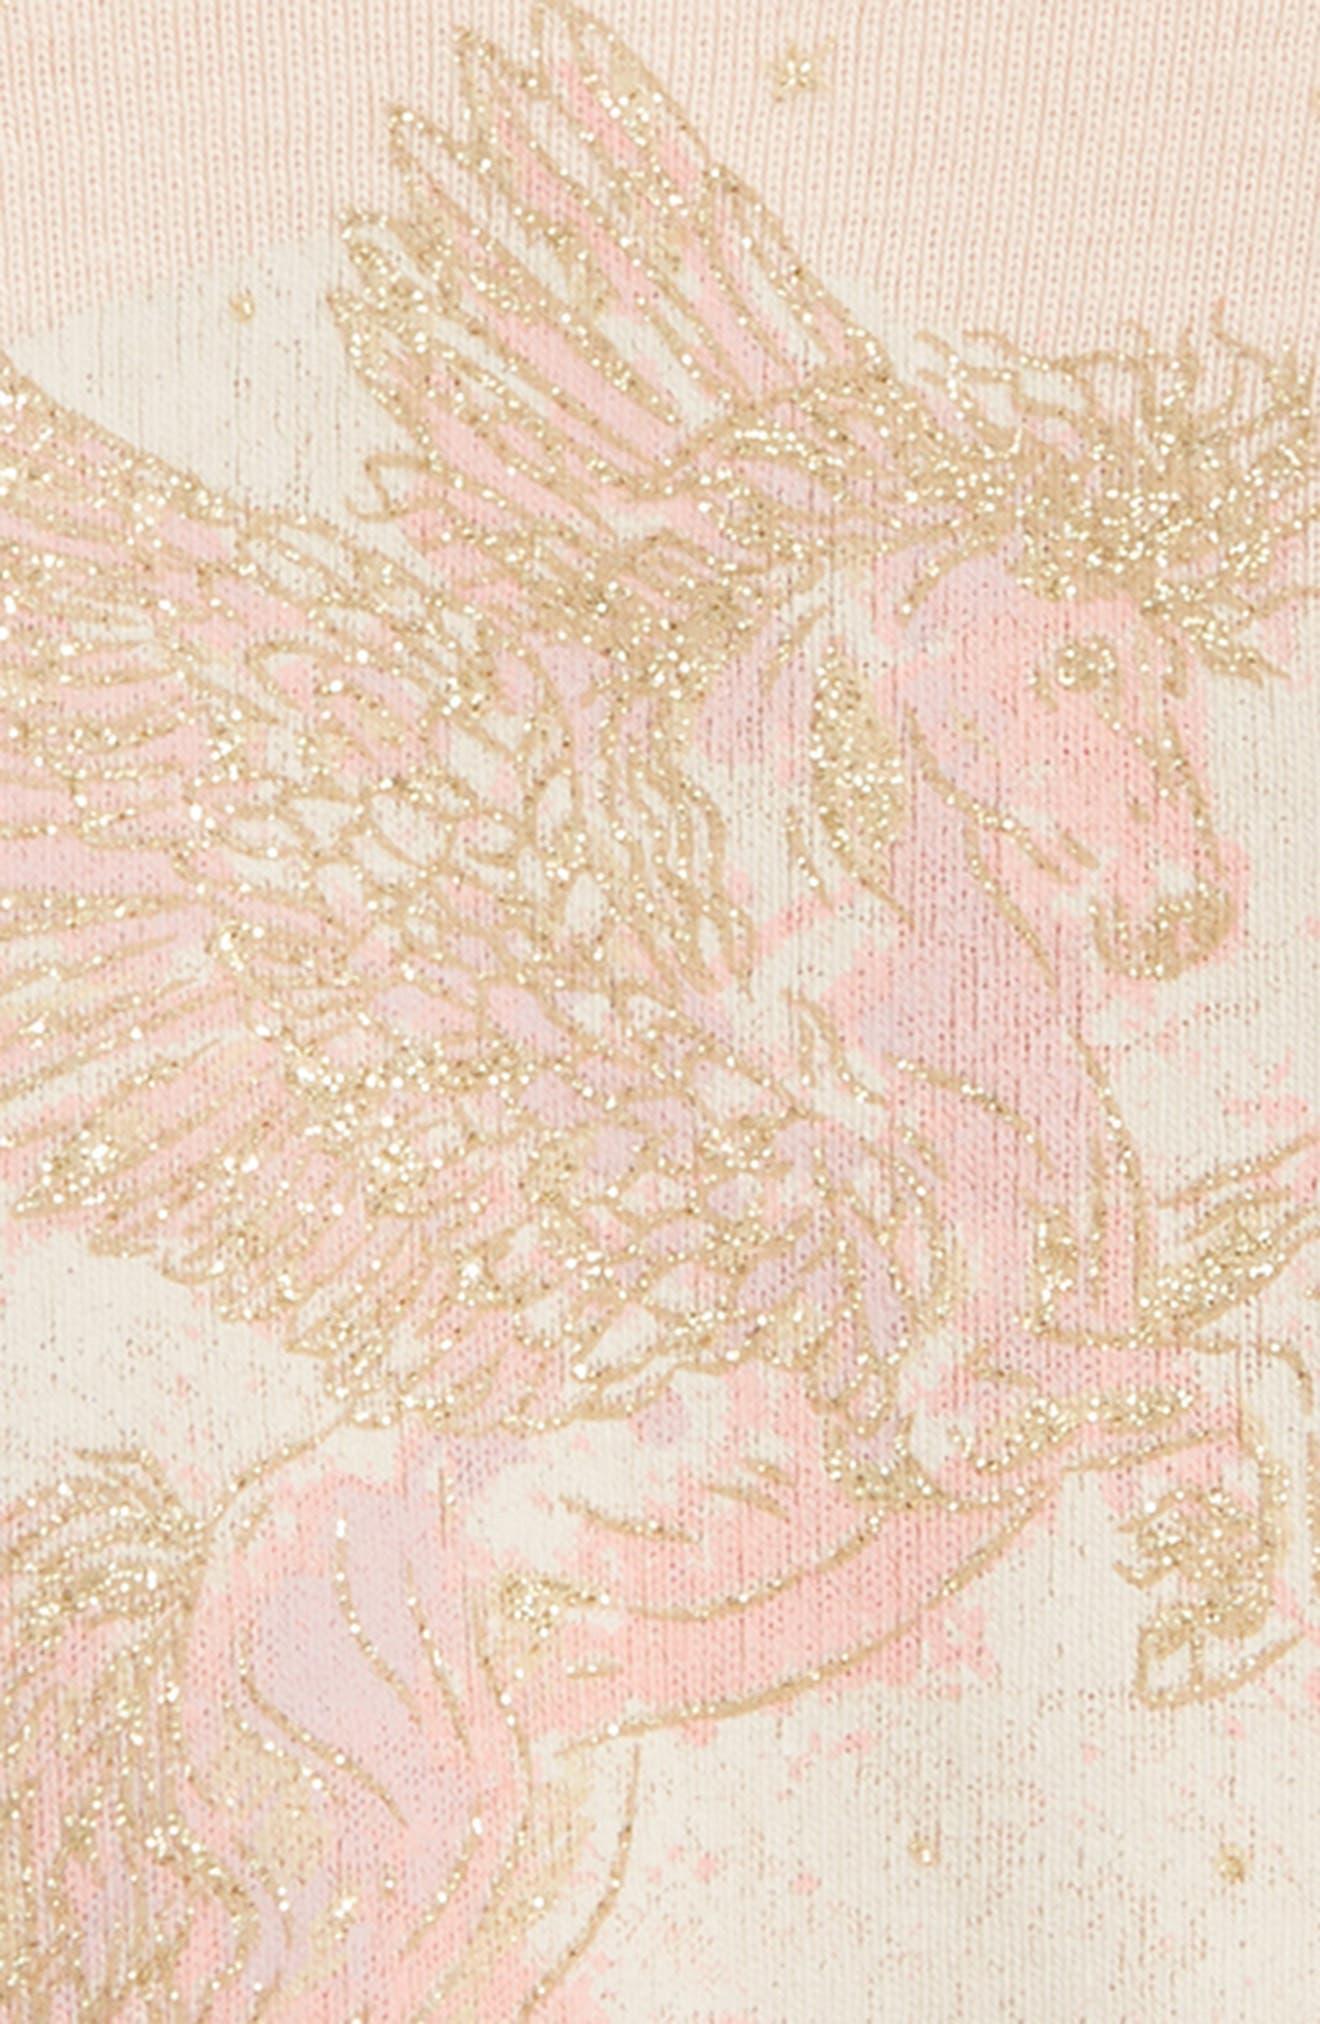 Pegasus Organic Cotton Tee,                             Alternate thumbnail 2, color,                             Powder